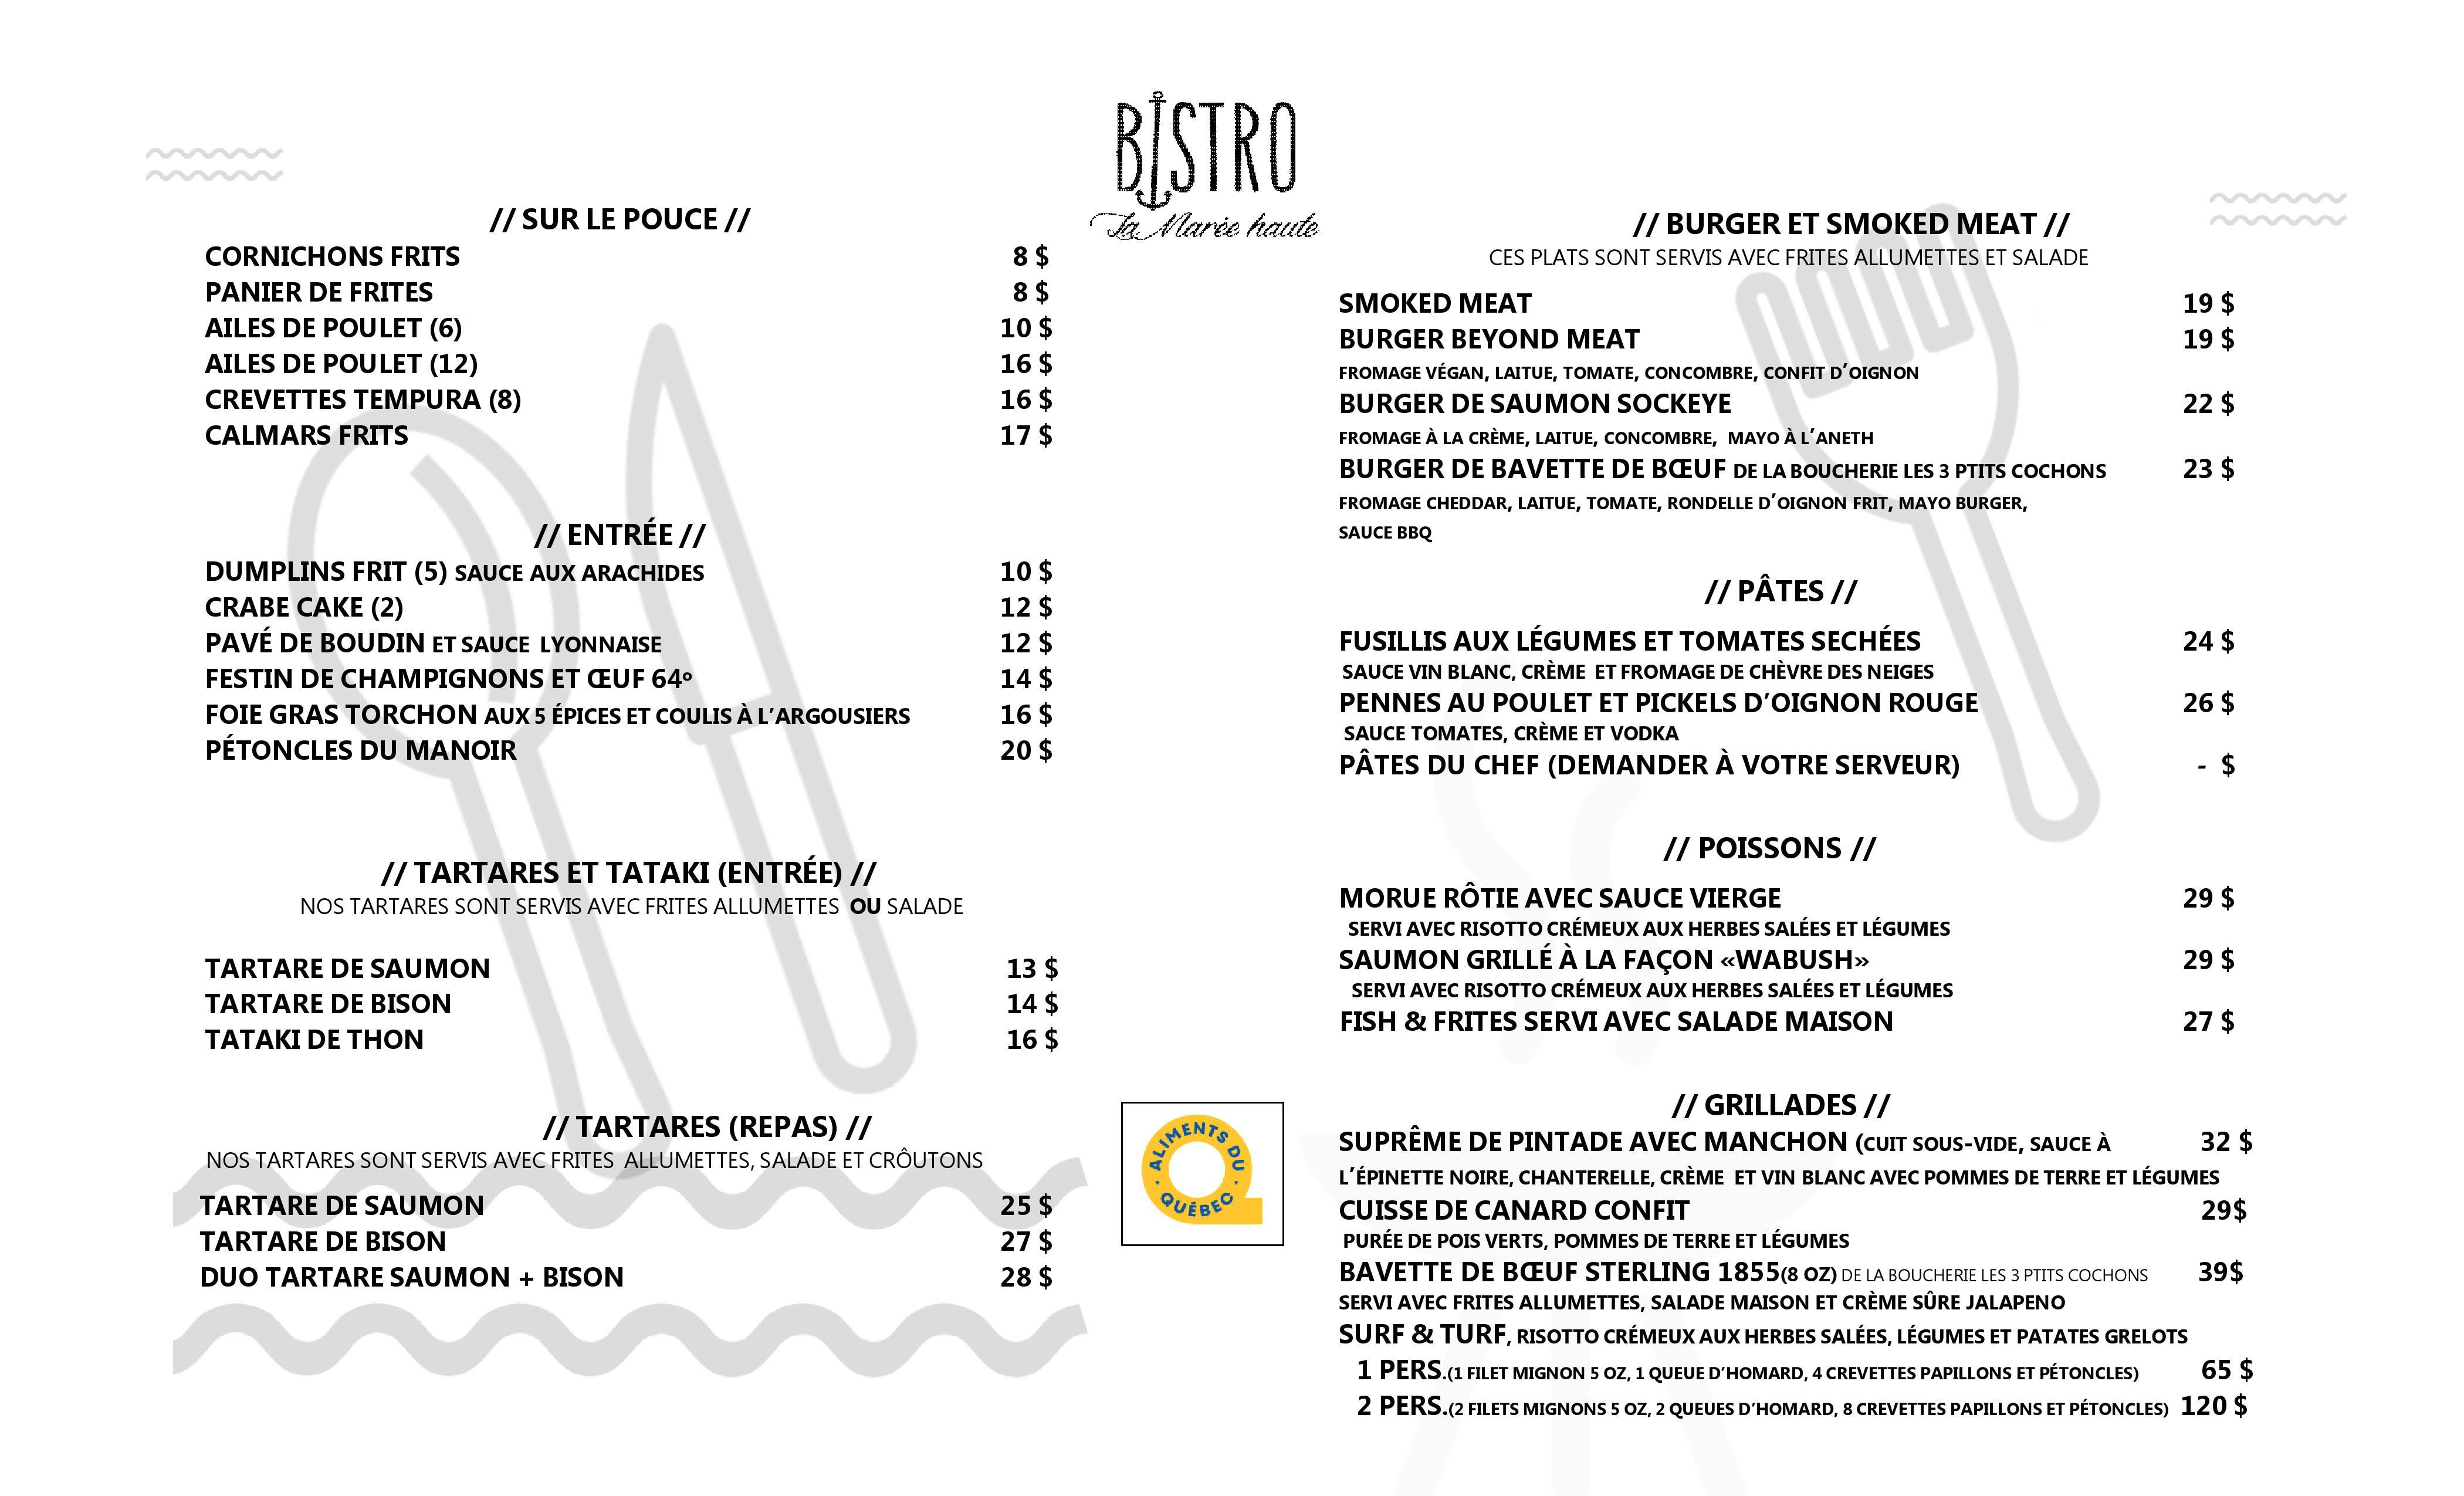 0-Menu Bistro SANS LES B-O 03 AOUT 2021-page-001 (1)